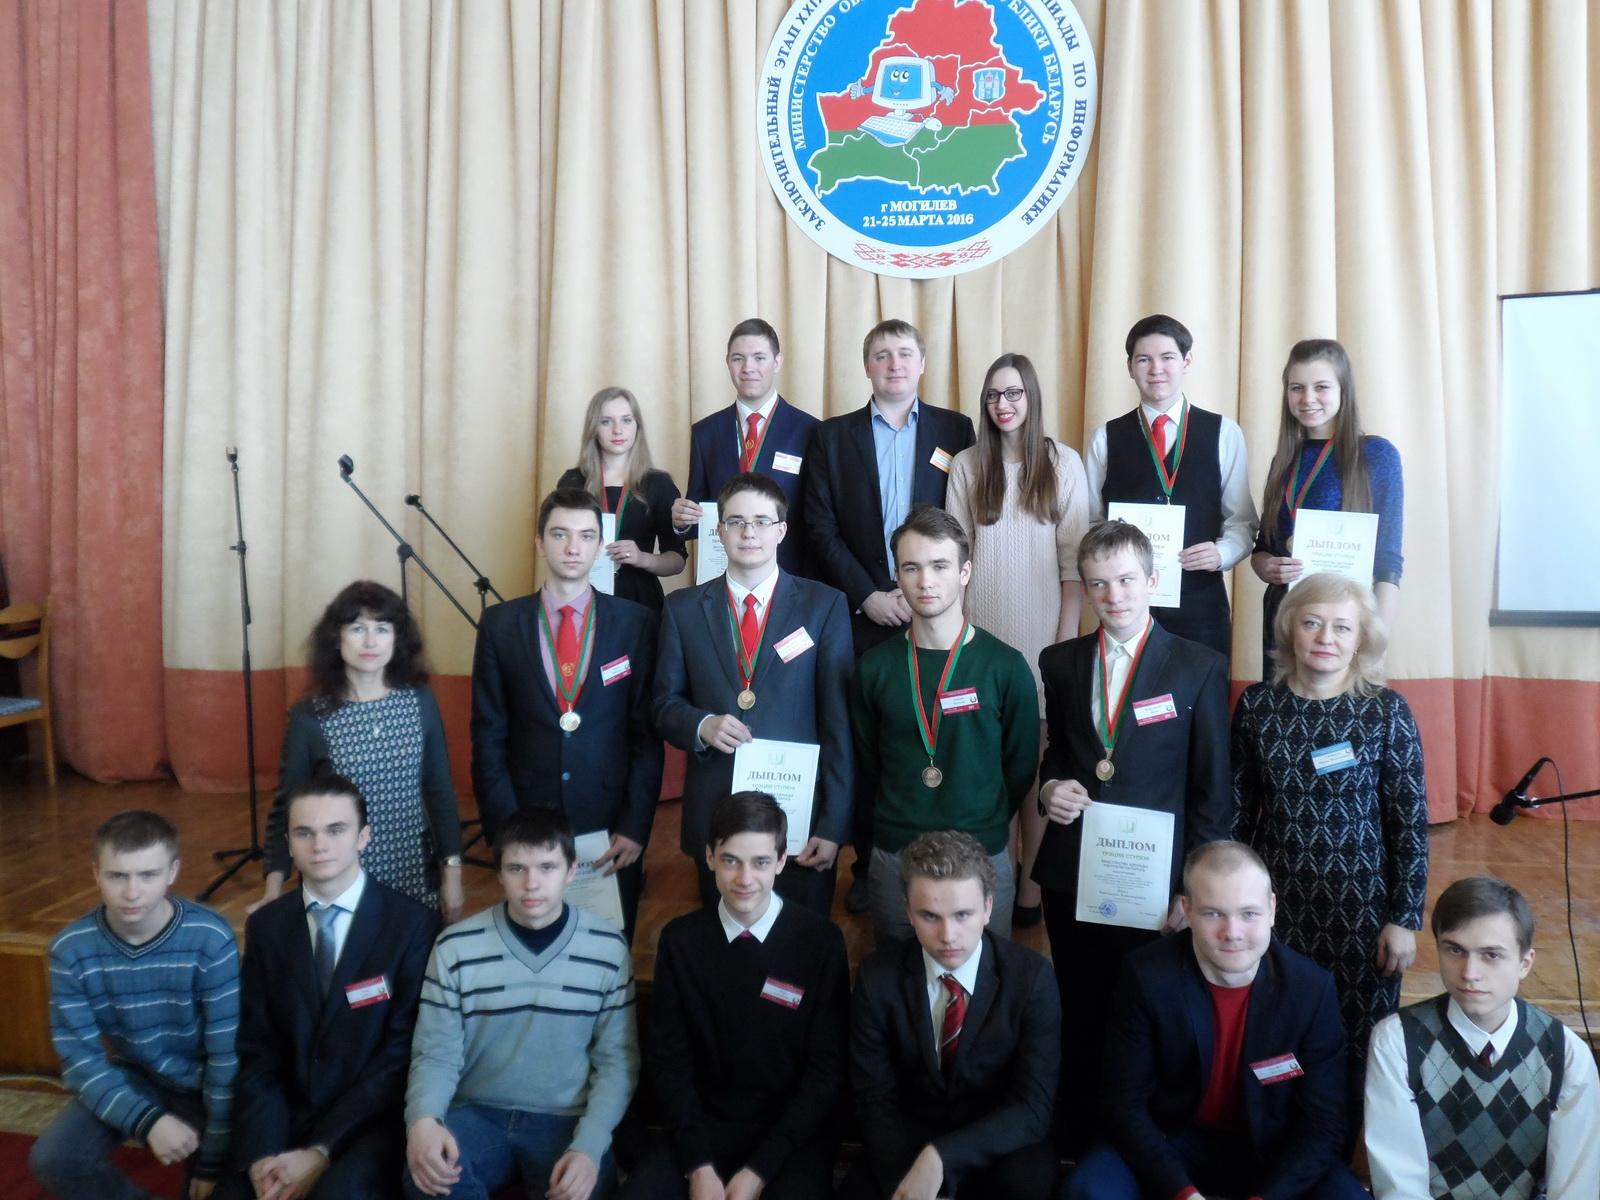 команда Вит области с членами жюри 2016